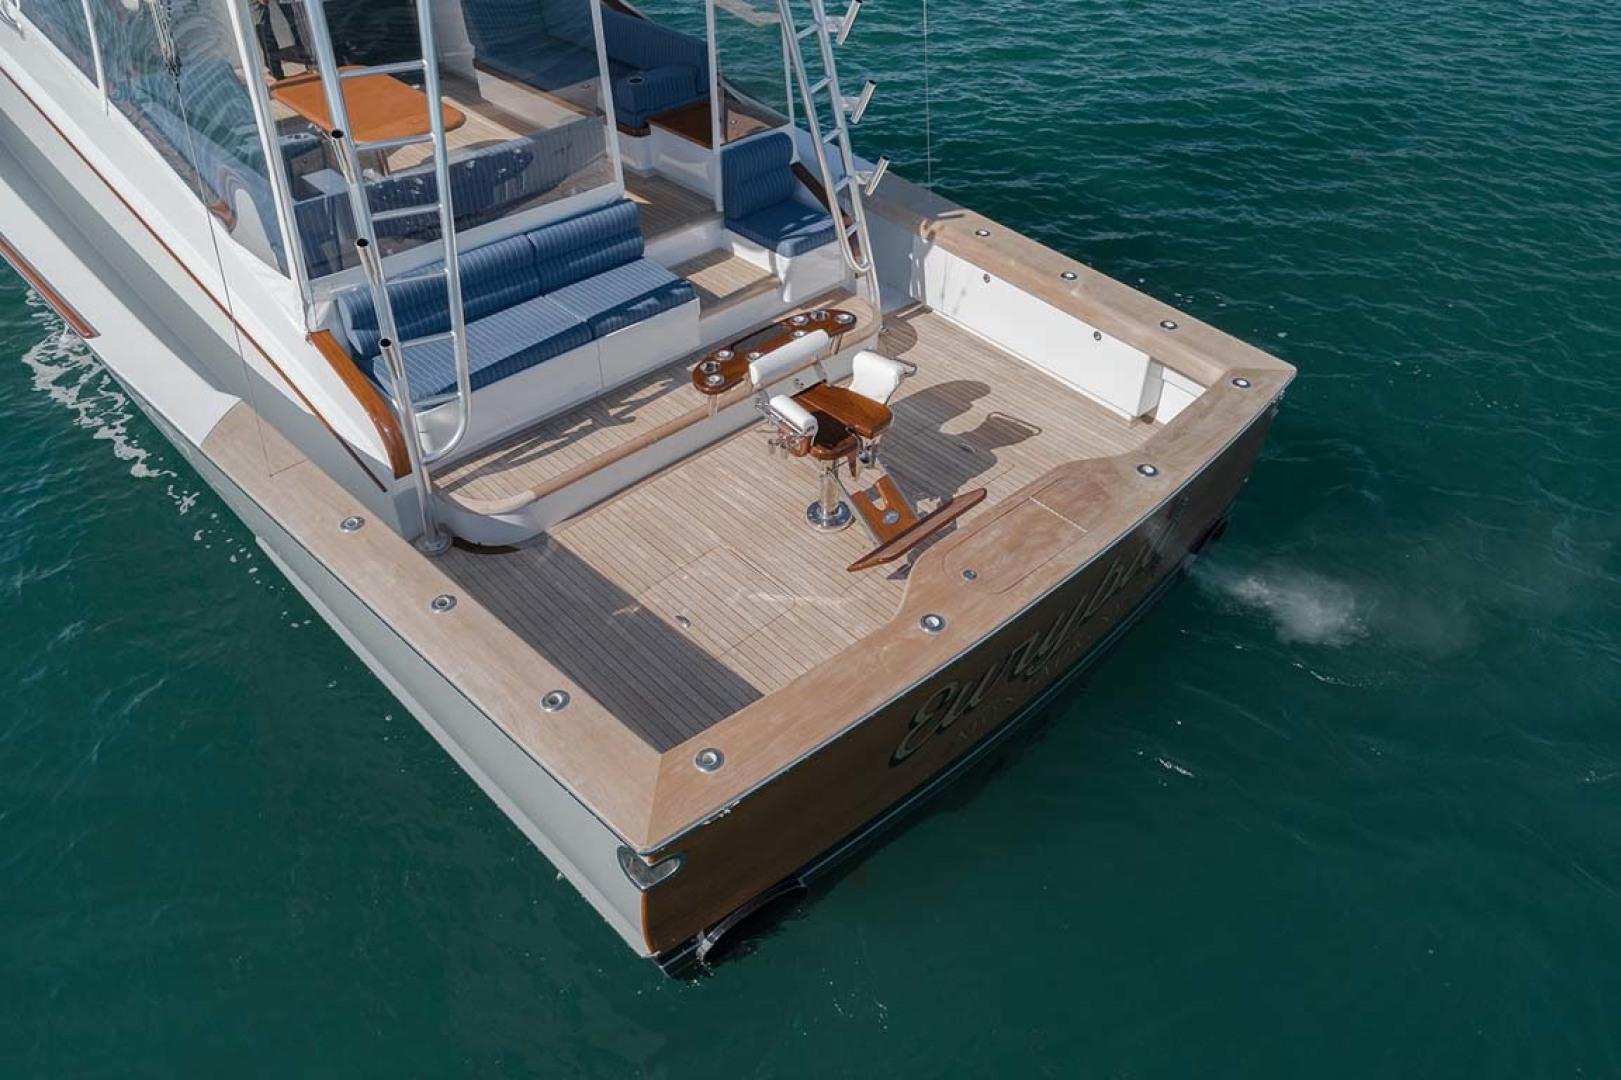 Jim Smith-Walkaround Express 2018-Eurybia North Palm Beach-Florida-United States-Cockpit-1573756   Thumbnail